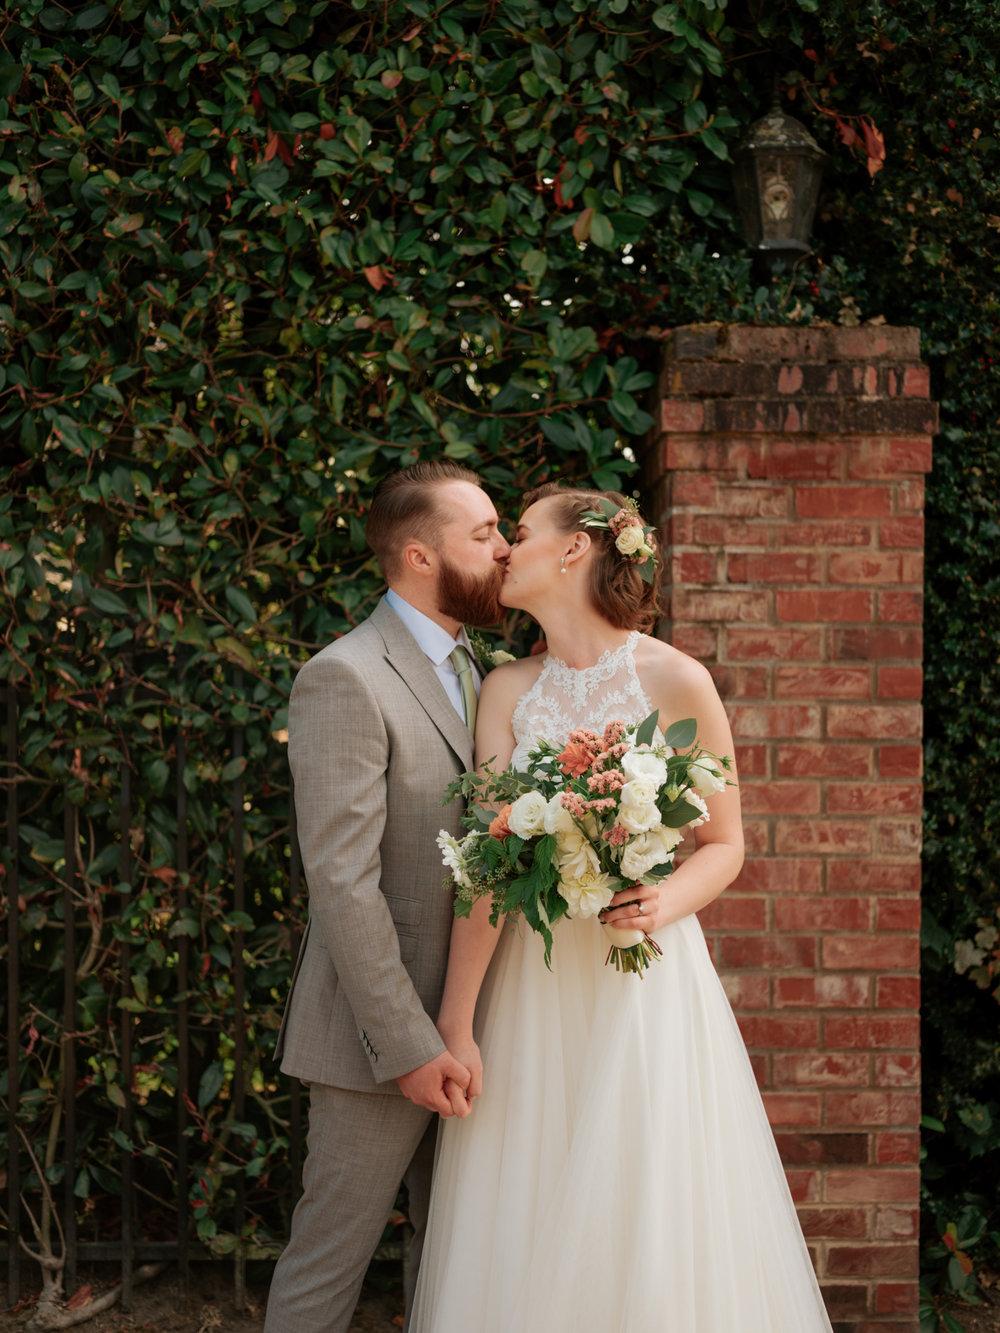 Stolen Glimpses Seattle Wedding Photographer Hidden Meadows Wedding 94.jpg